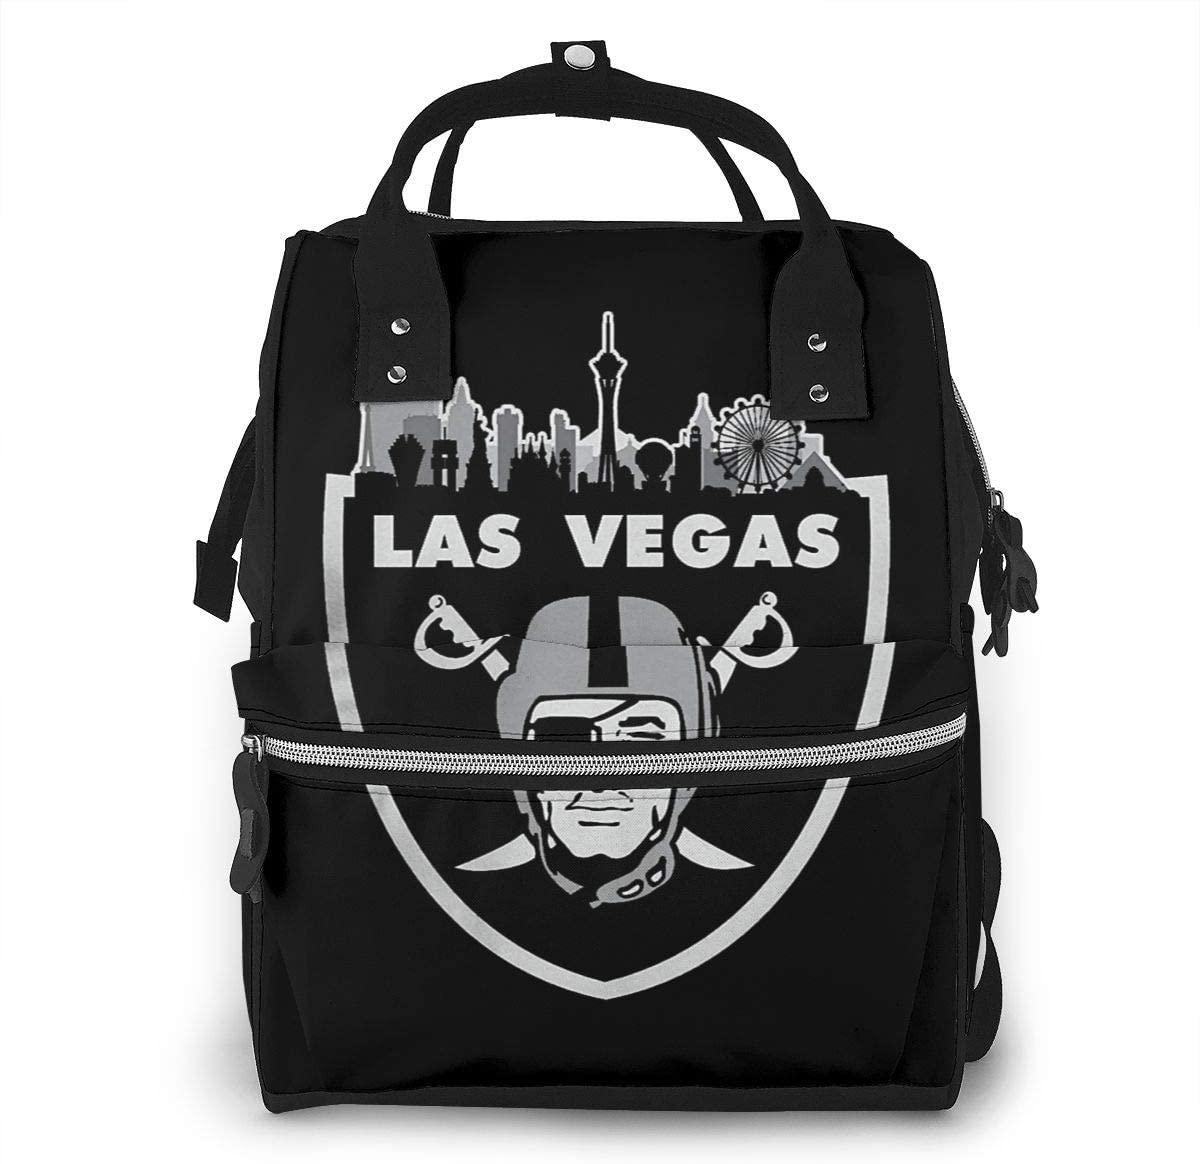 Sherrygeoffrey Las Vegas Raiders Inspired Fans Diaper Backpack Large Capacity Travel Bag